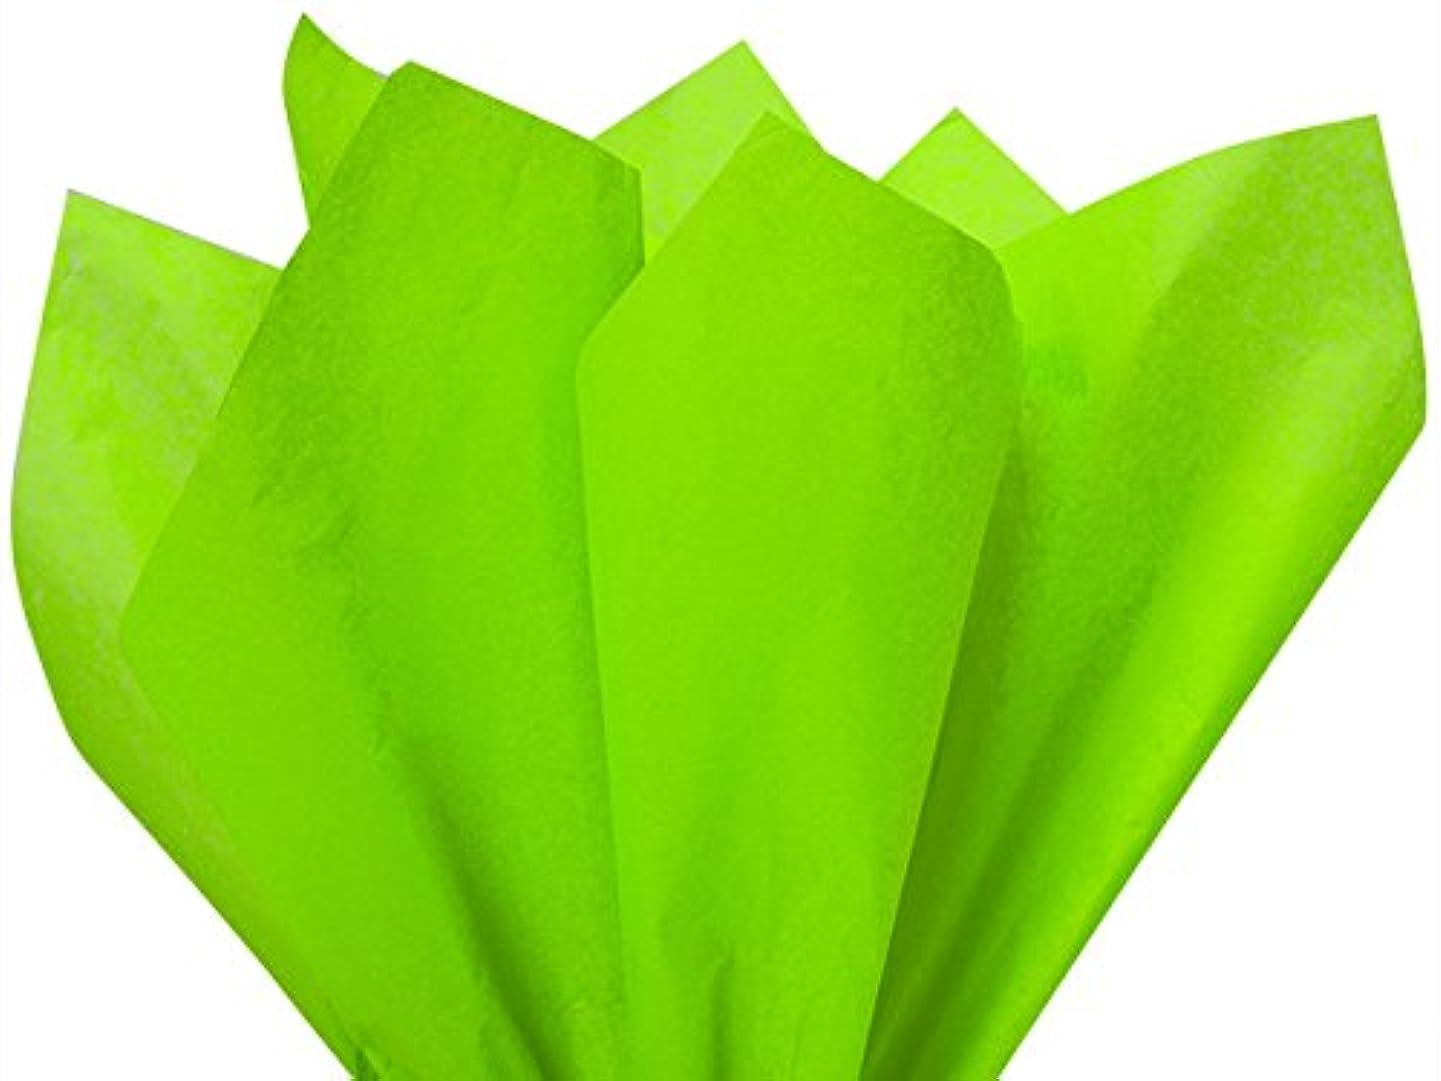 Bright Lime Tissue Paper 15 x 20 100 Sheets Premium Quality Tissue Paper by A1 bakery supplies rgqbuvfdlvgebrau